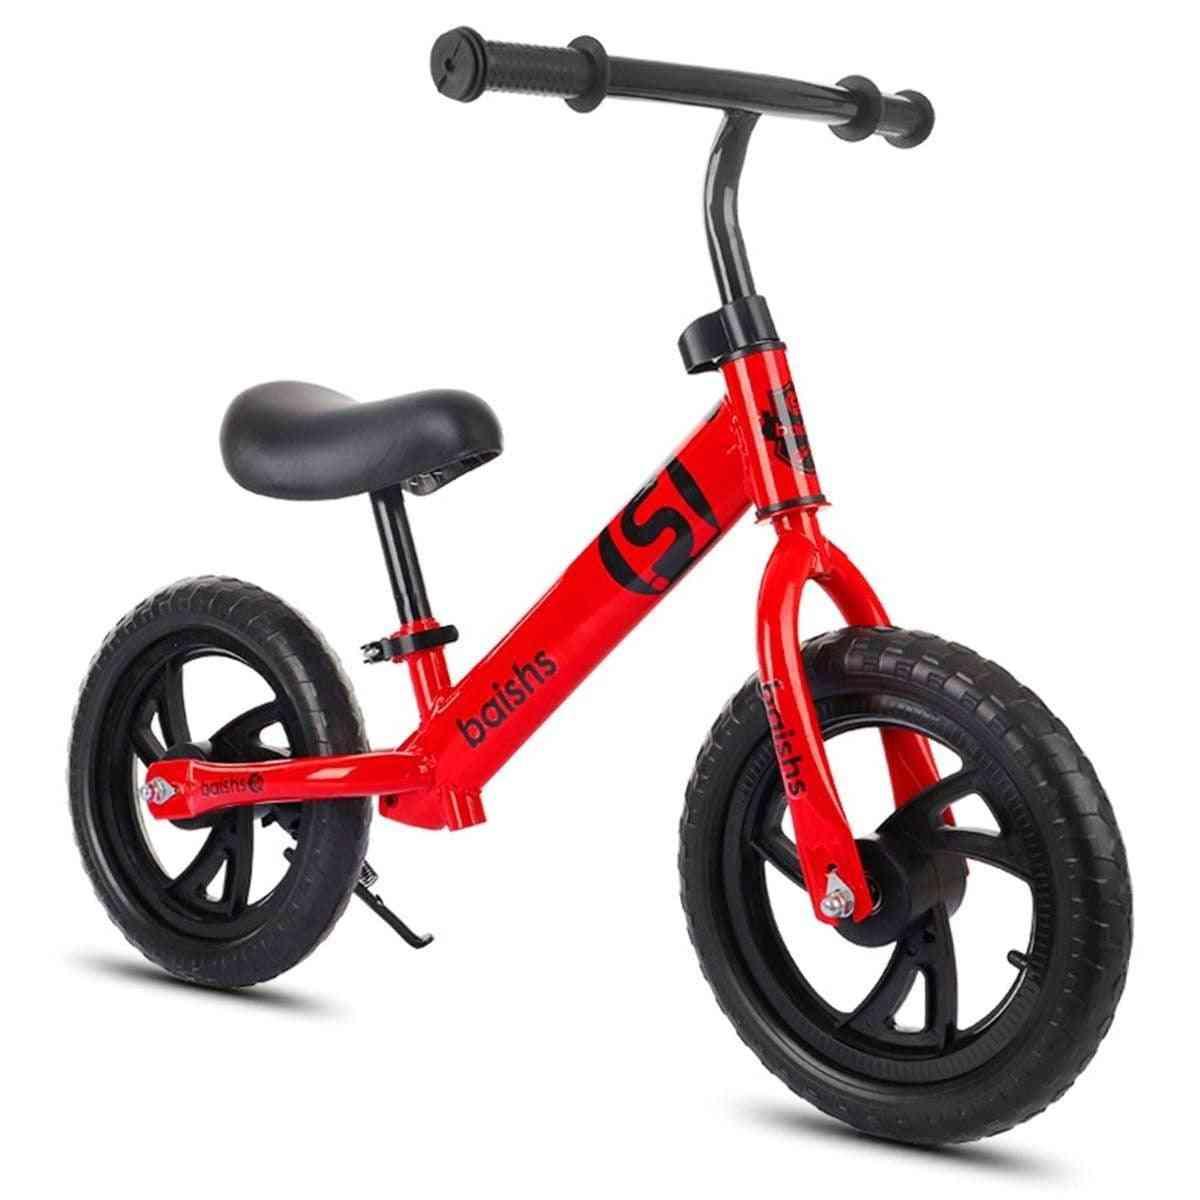 Doki Toy 12 Inch Balance Bike Walker Kids